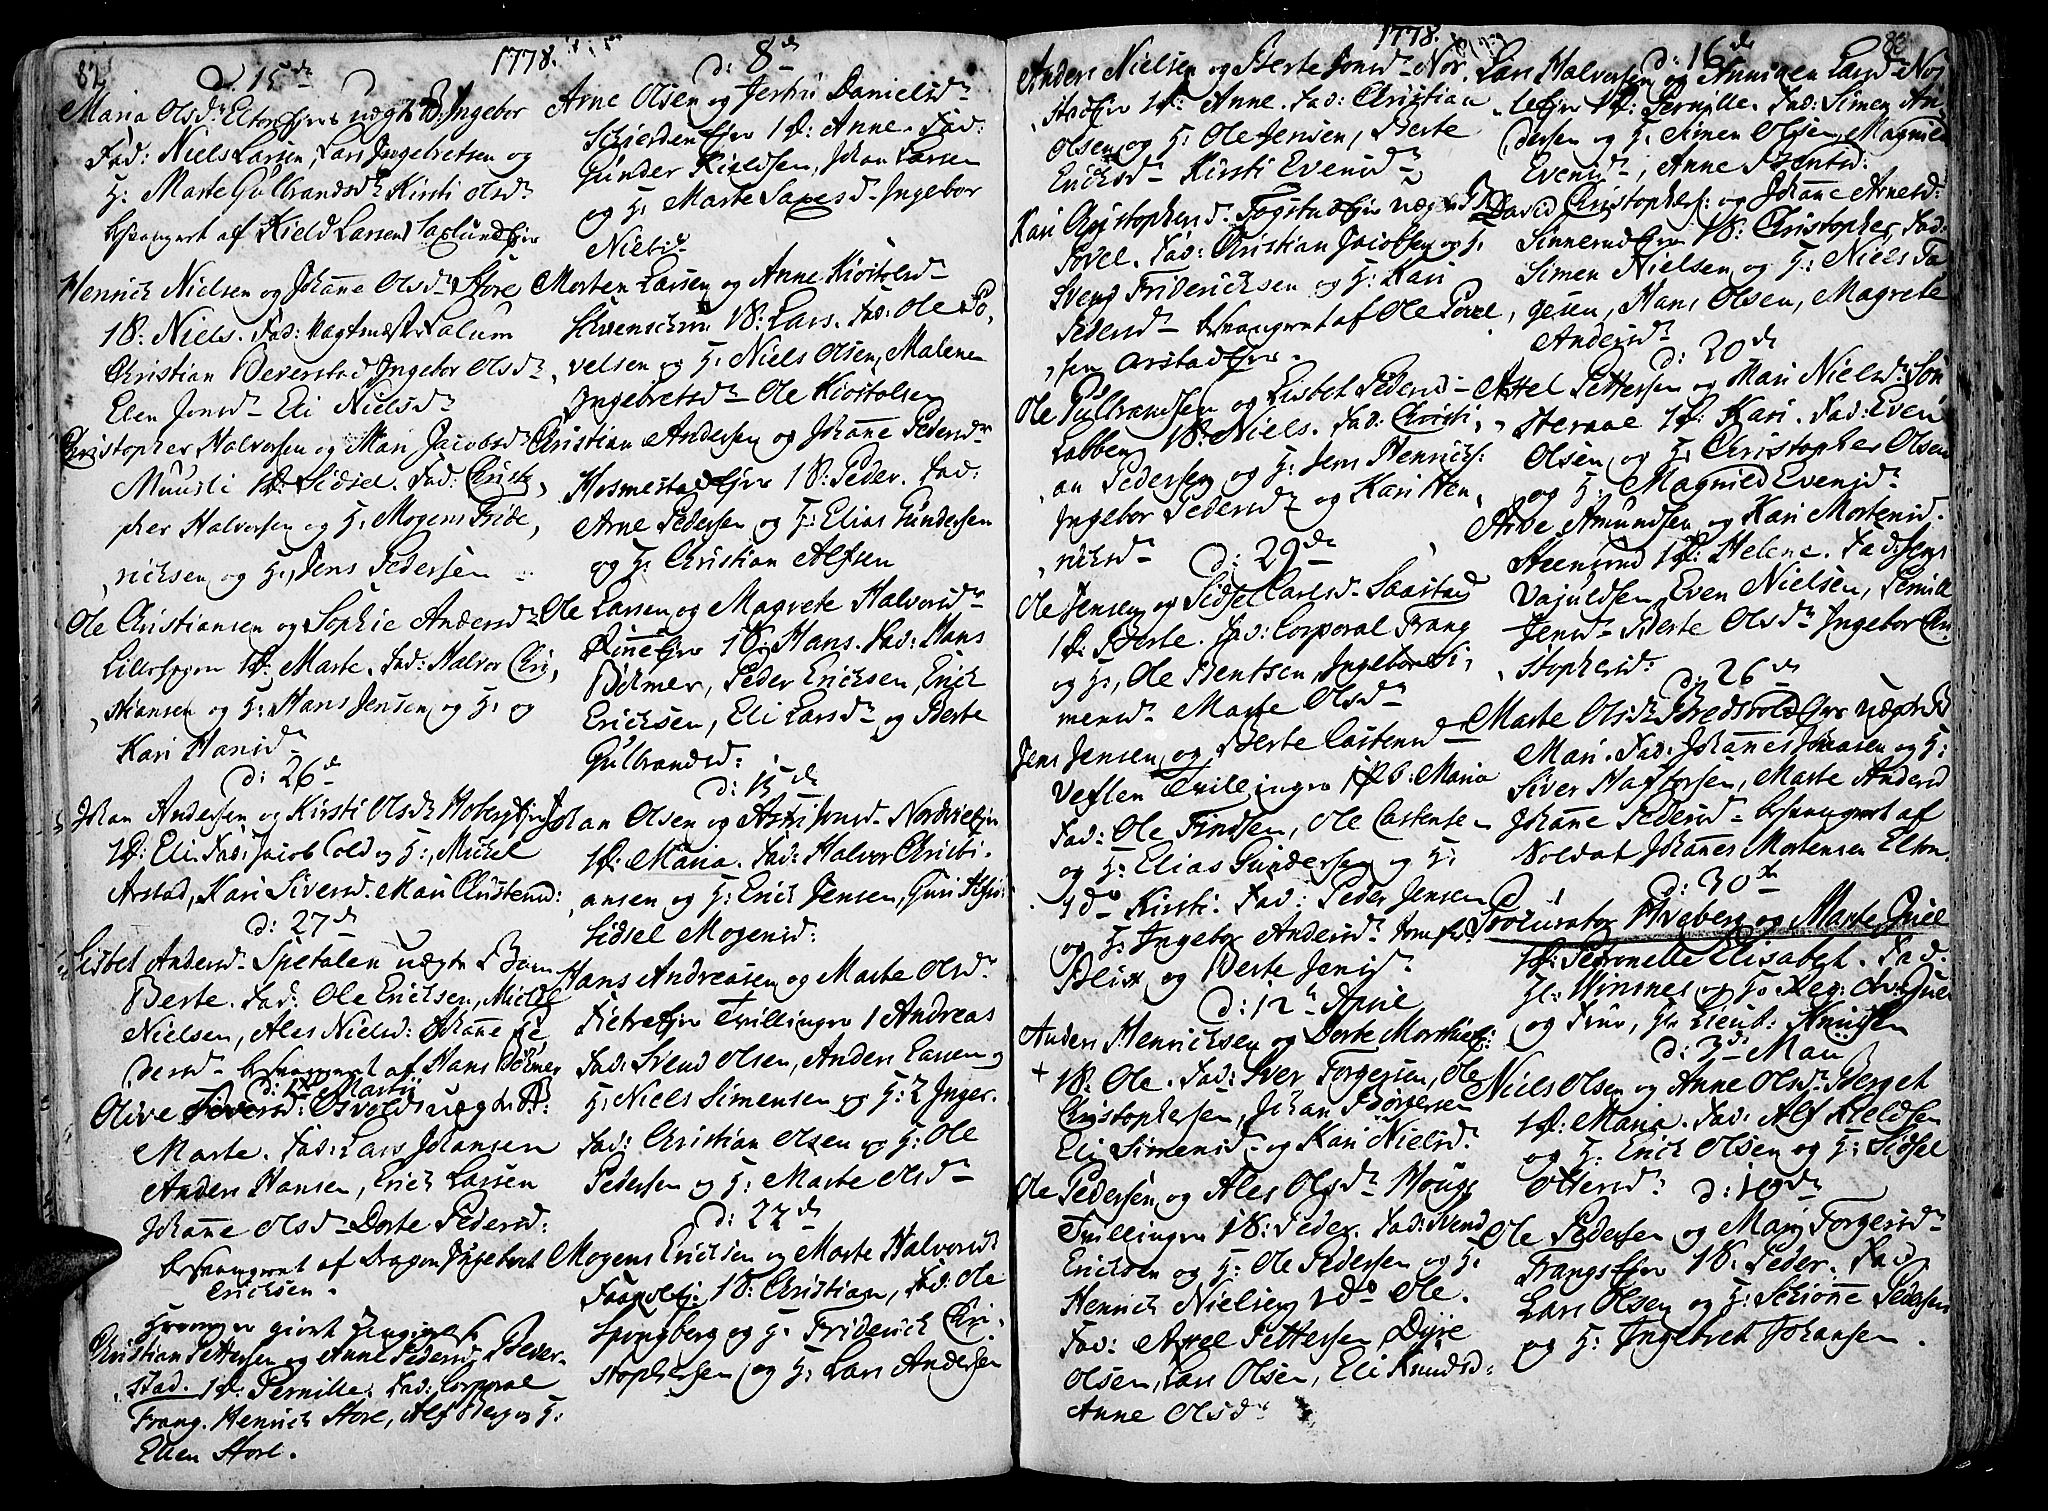 SAH, Stange prestekontor, K/L0006: Ministerialbok nr. 6, 1762-1787, s. 82-83